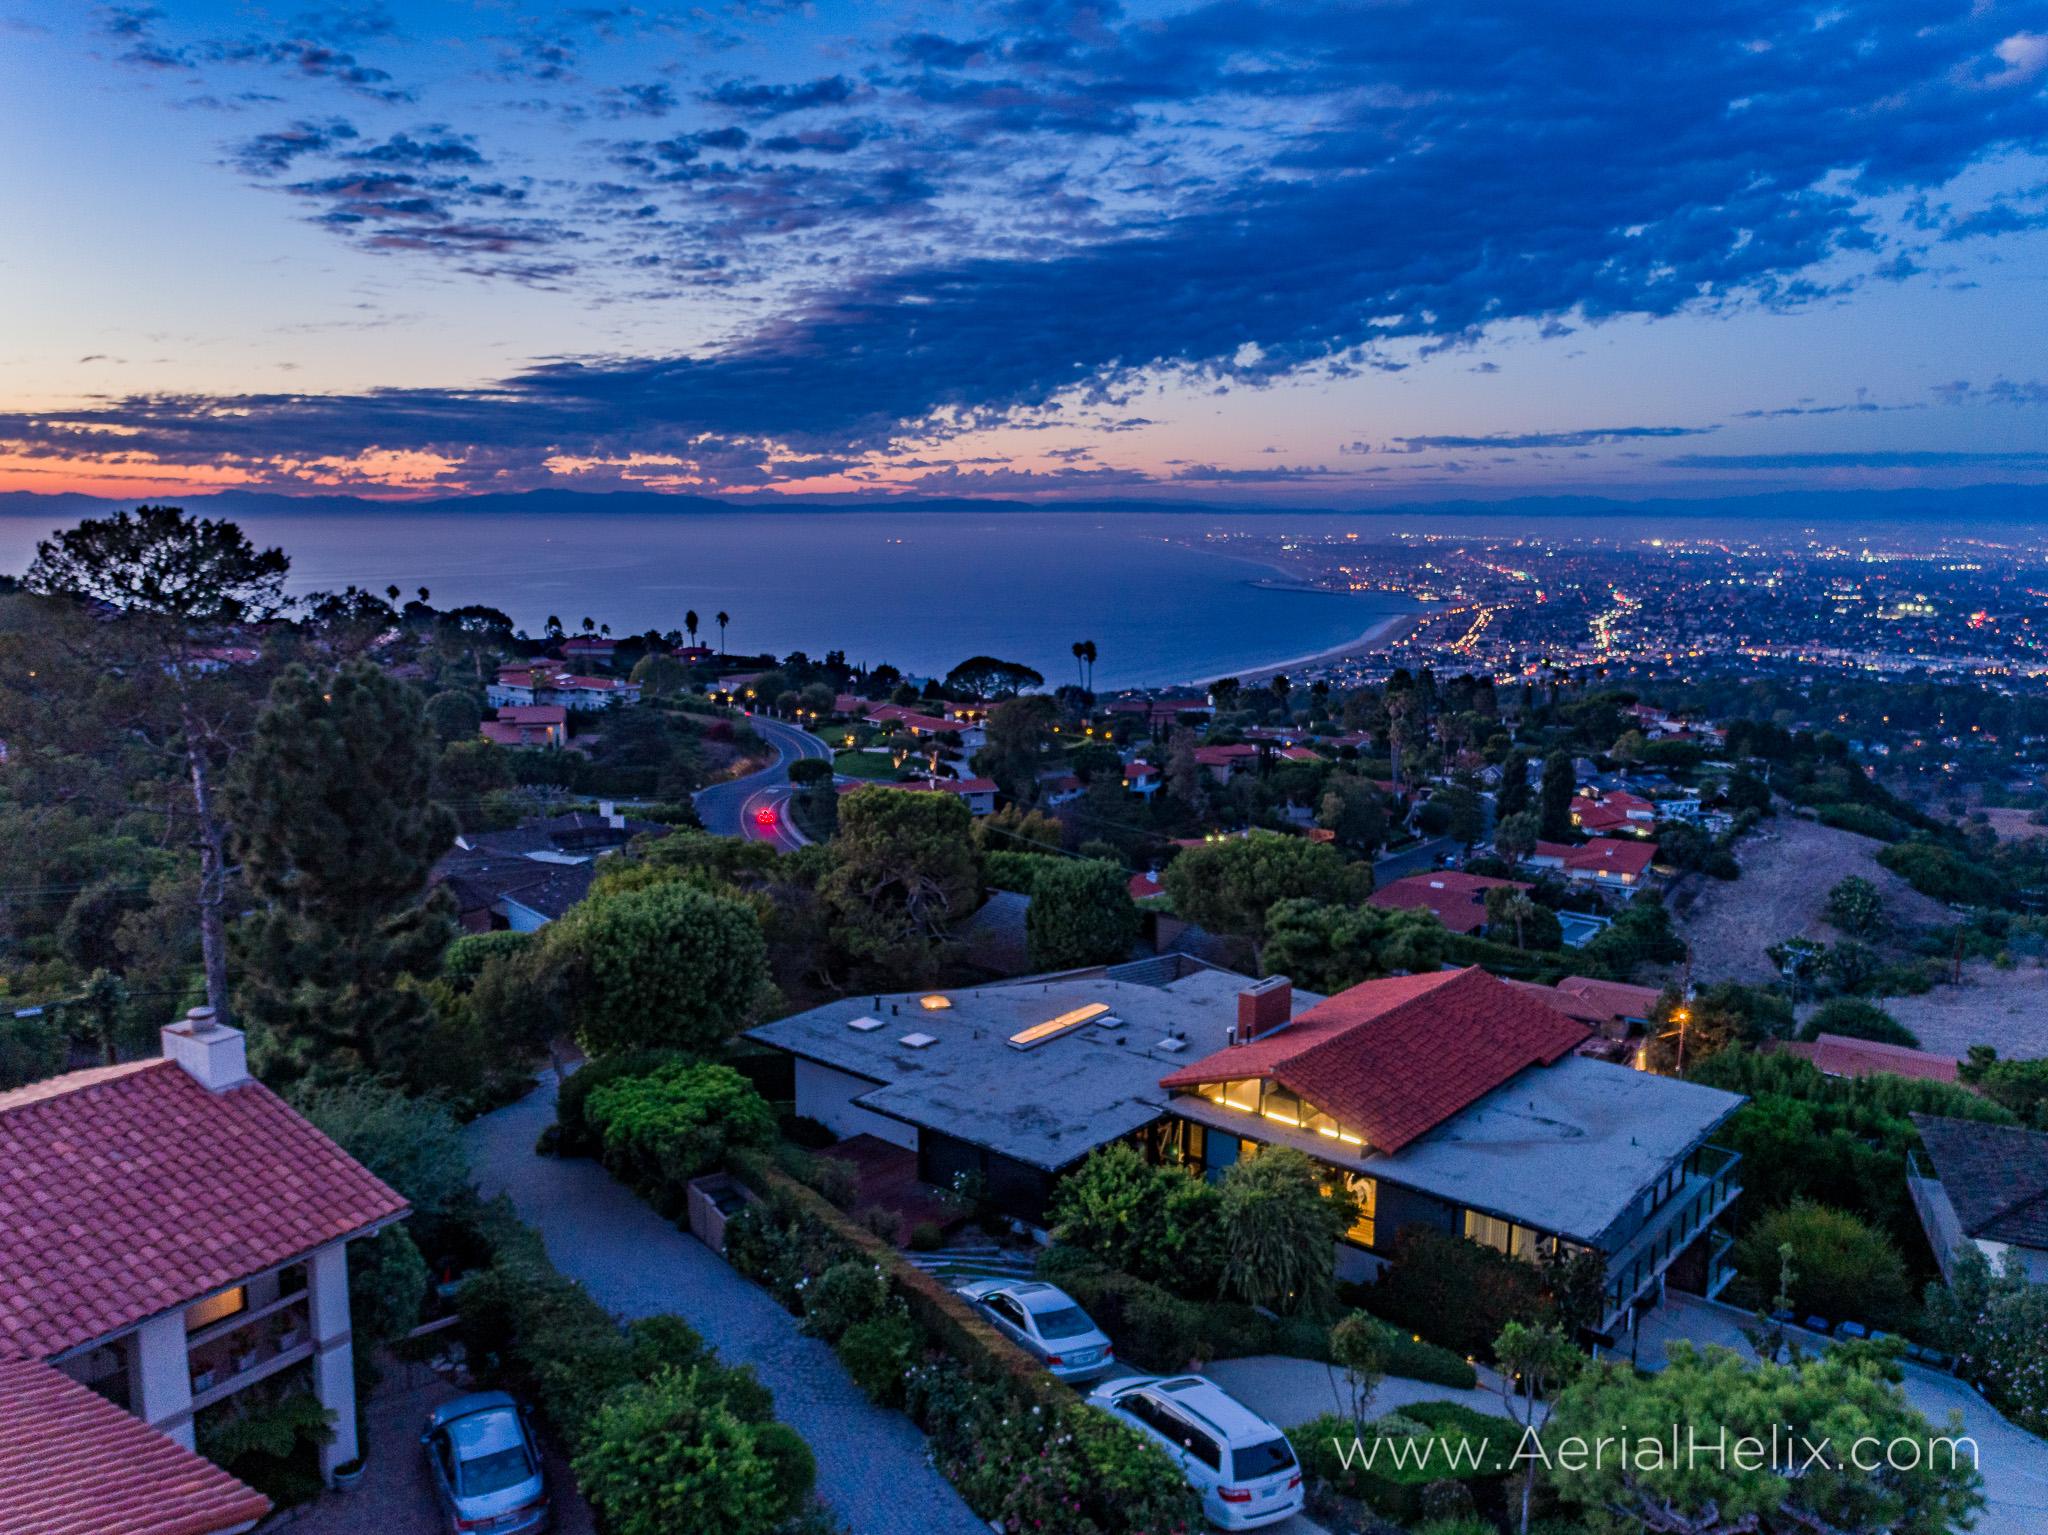 Woodfern Drive - HELIX Real Estate Aerial Photographer-35.jpg